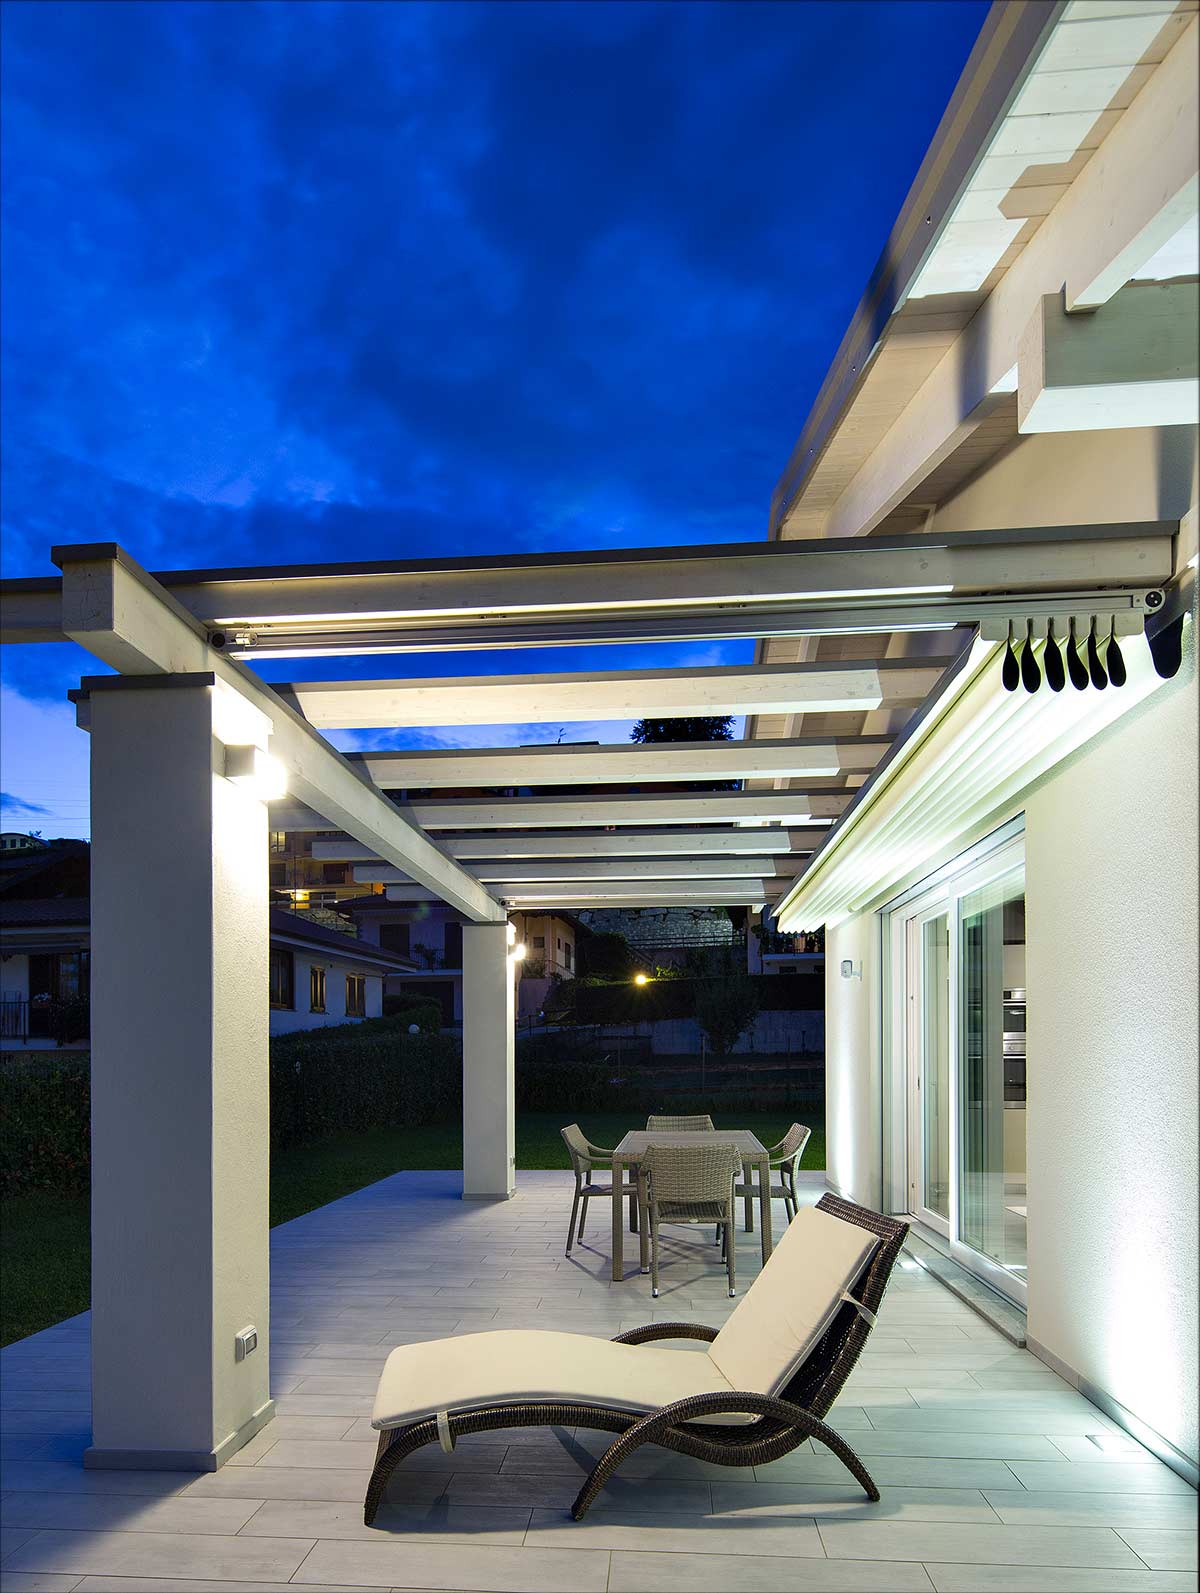 Autonomia-energia-elettrica-case-in-legno-Kager